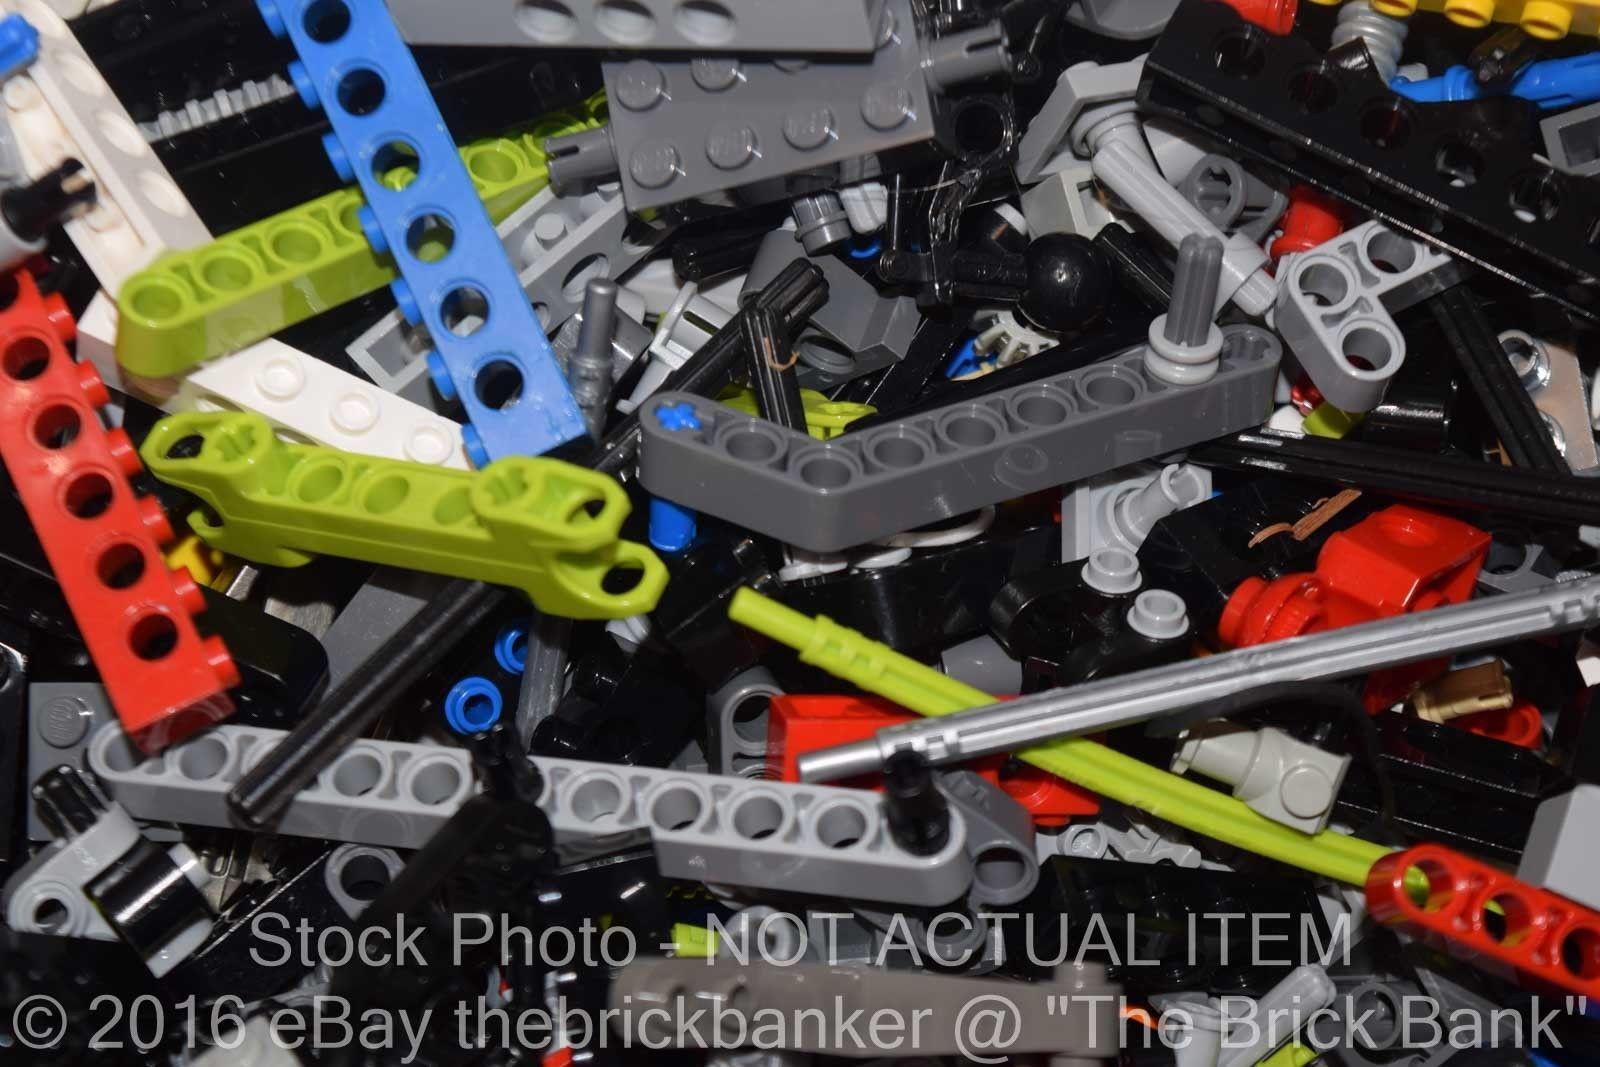 LEGO TECHNIC Mindstorms Bulk Lot 1 lb Pound of RANDOM Beams Gears Axles Parts